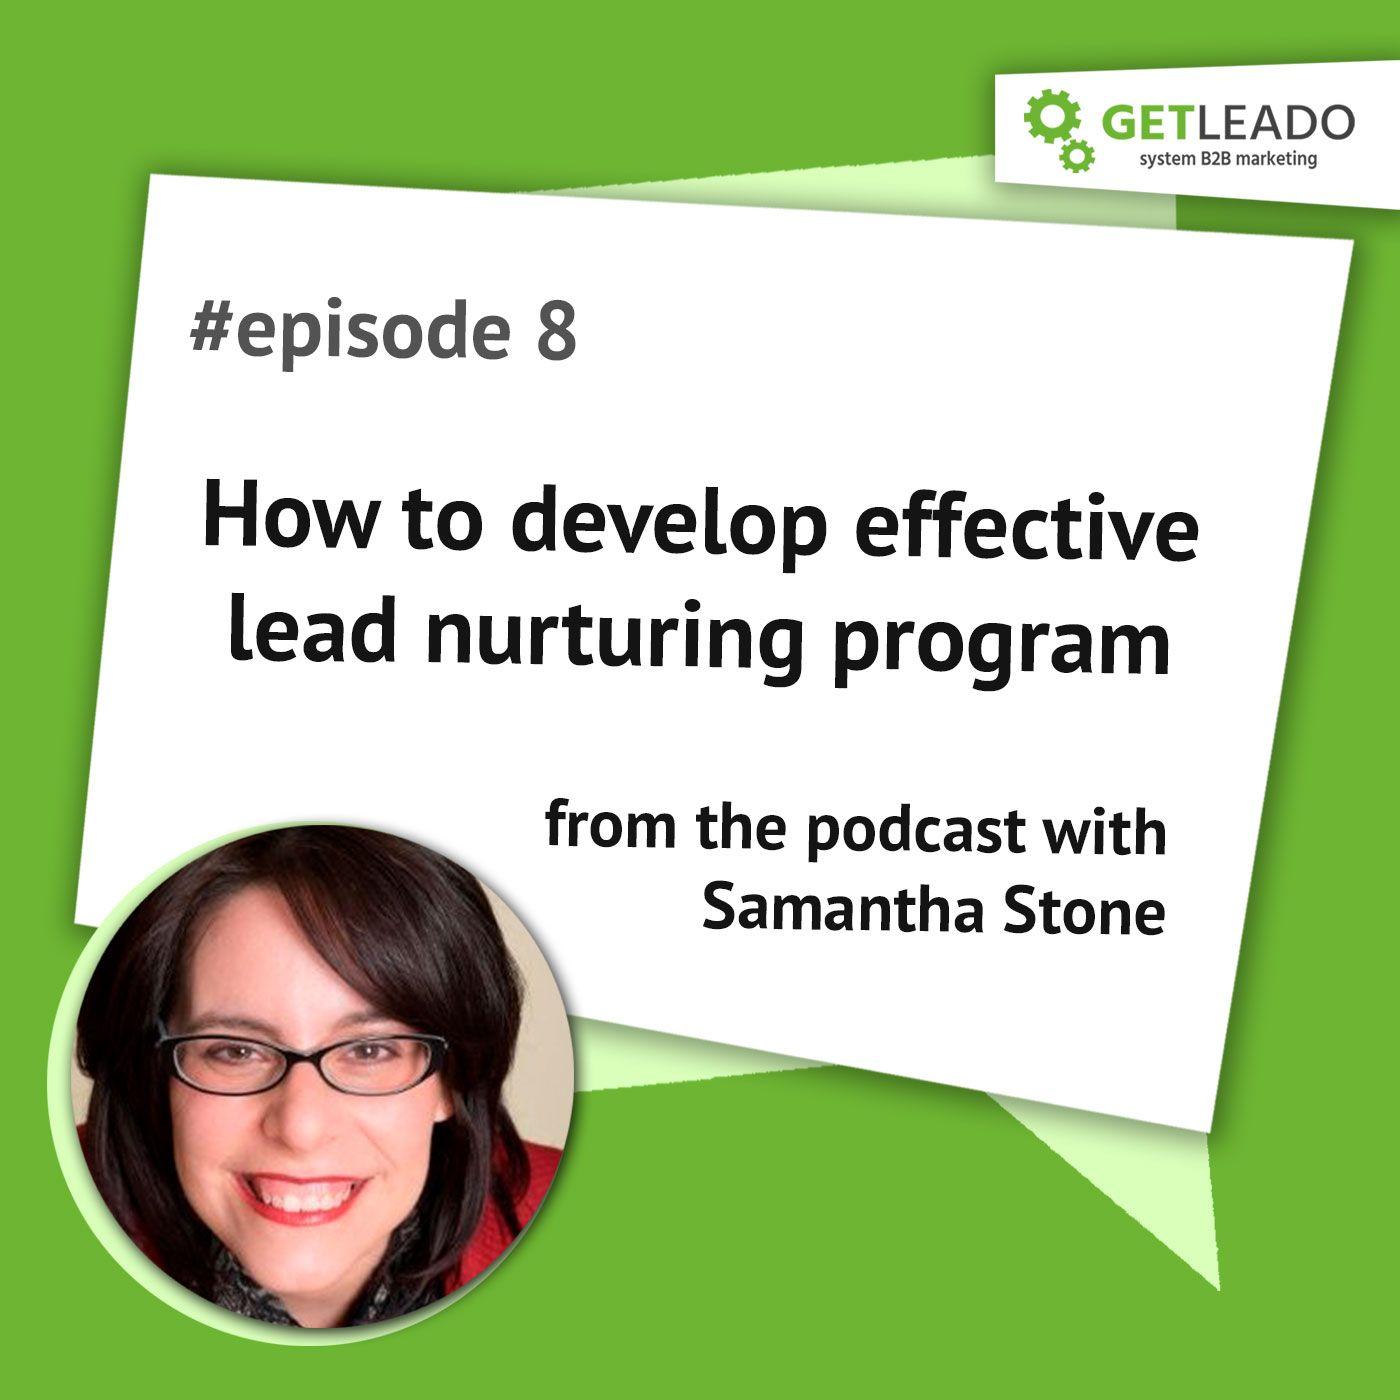 Episode 8. How to develop an effective lead nurturing program with Samantha Stone